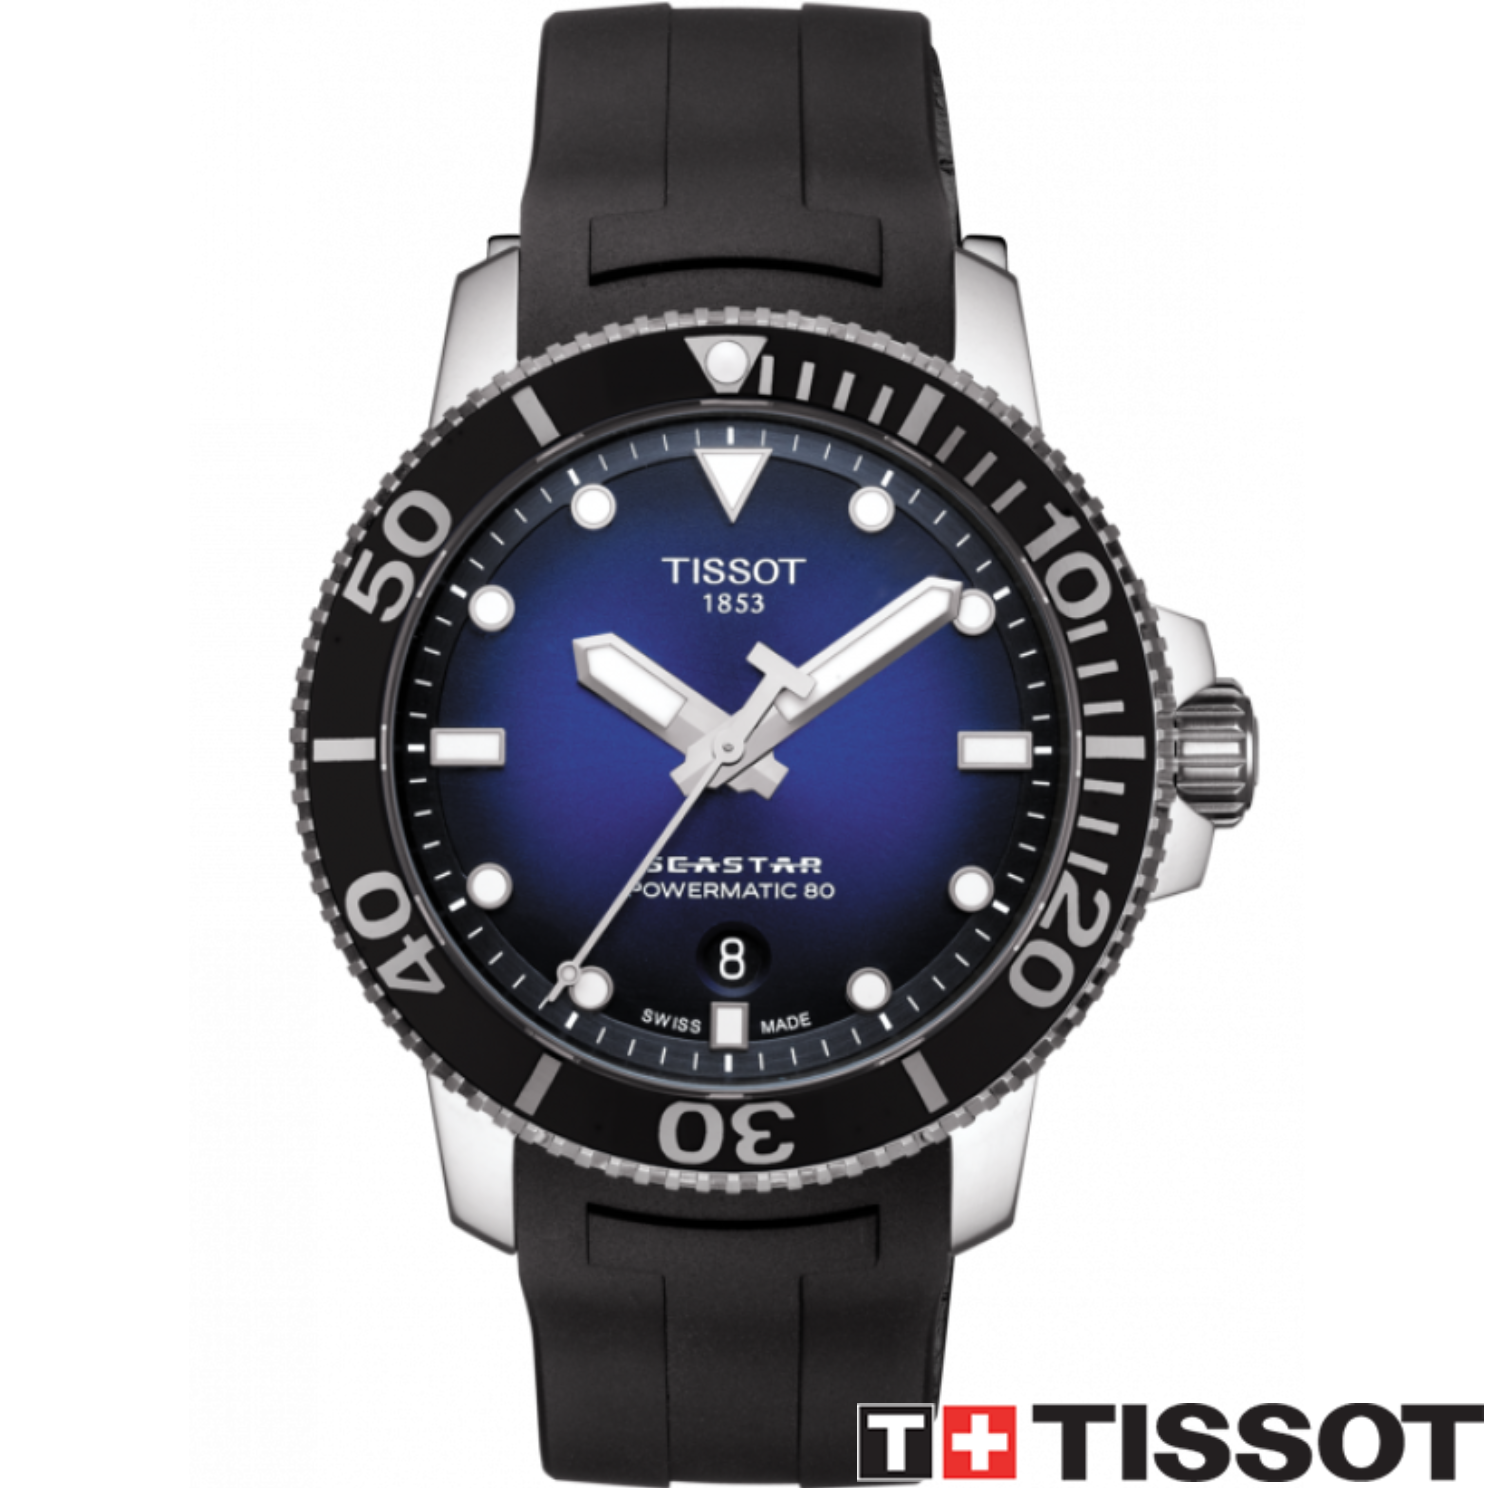 TISSOT 天梭錶 SEASTAR 1000海洋之星300米潛水機械錶T1204071704100藍x黑 / 43mm 0